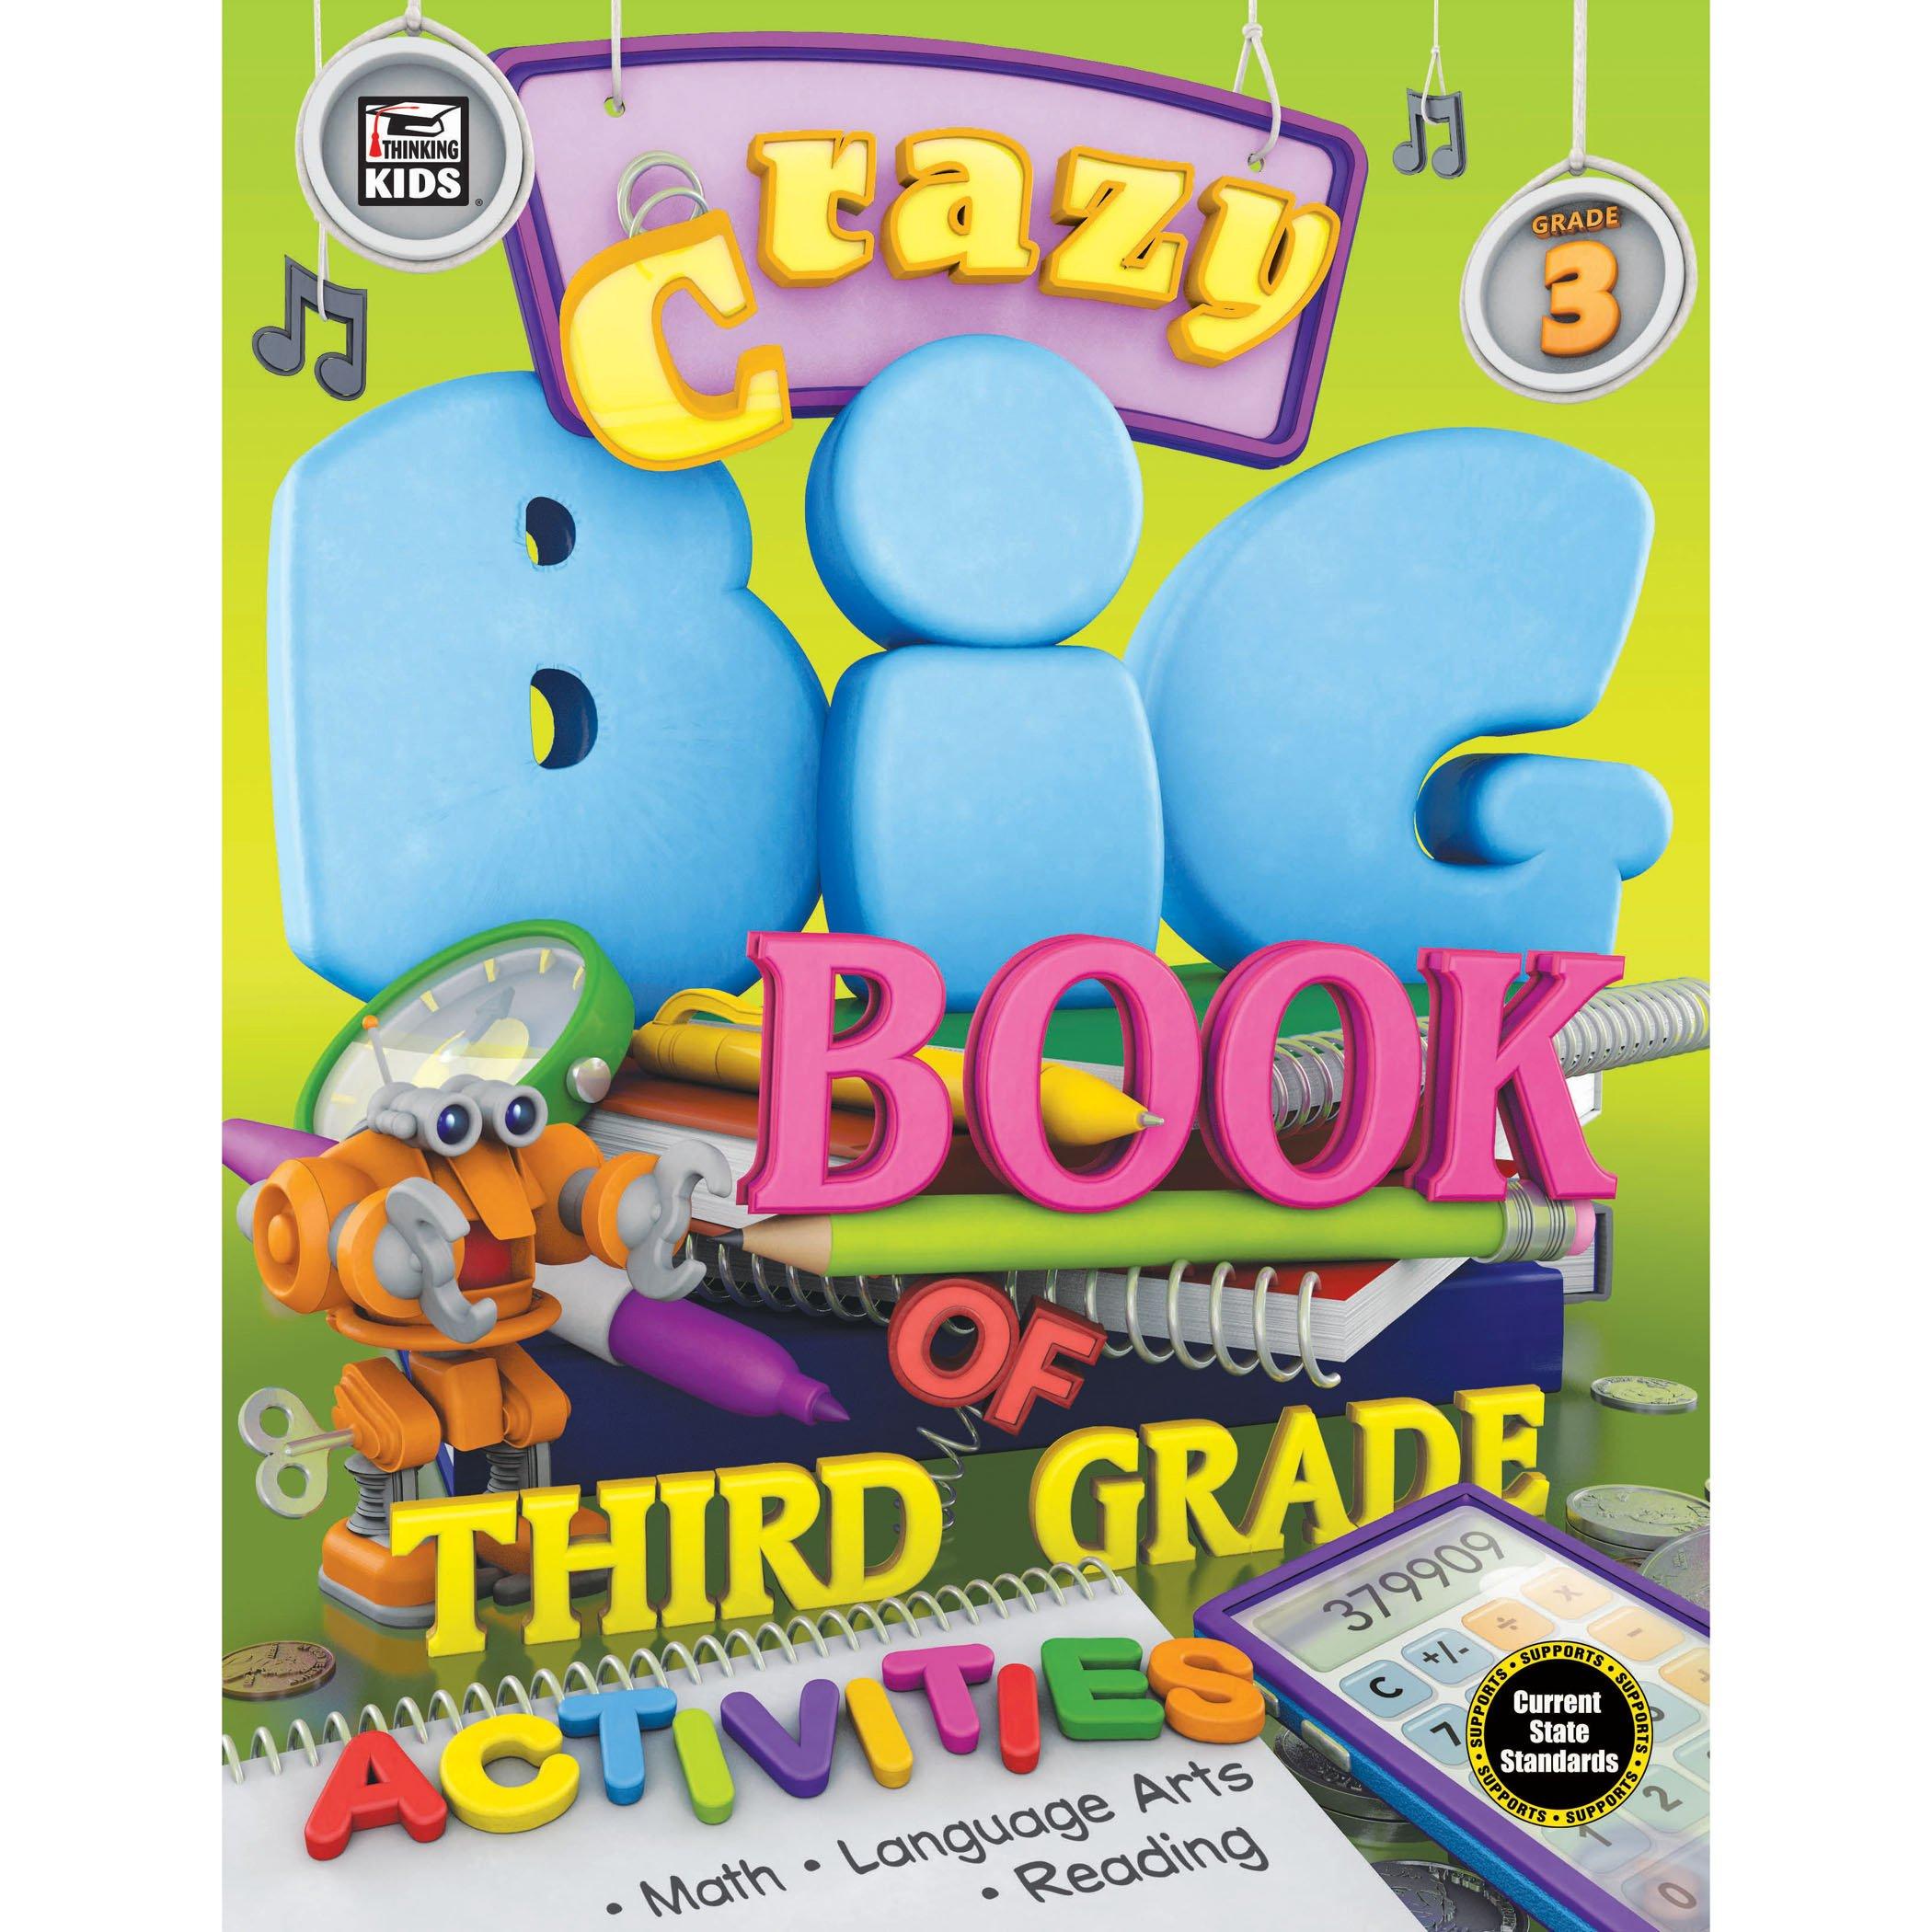 Crazy Big Book of Third Grade Activities pdf